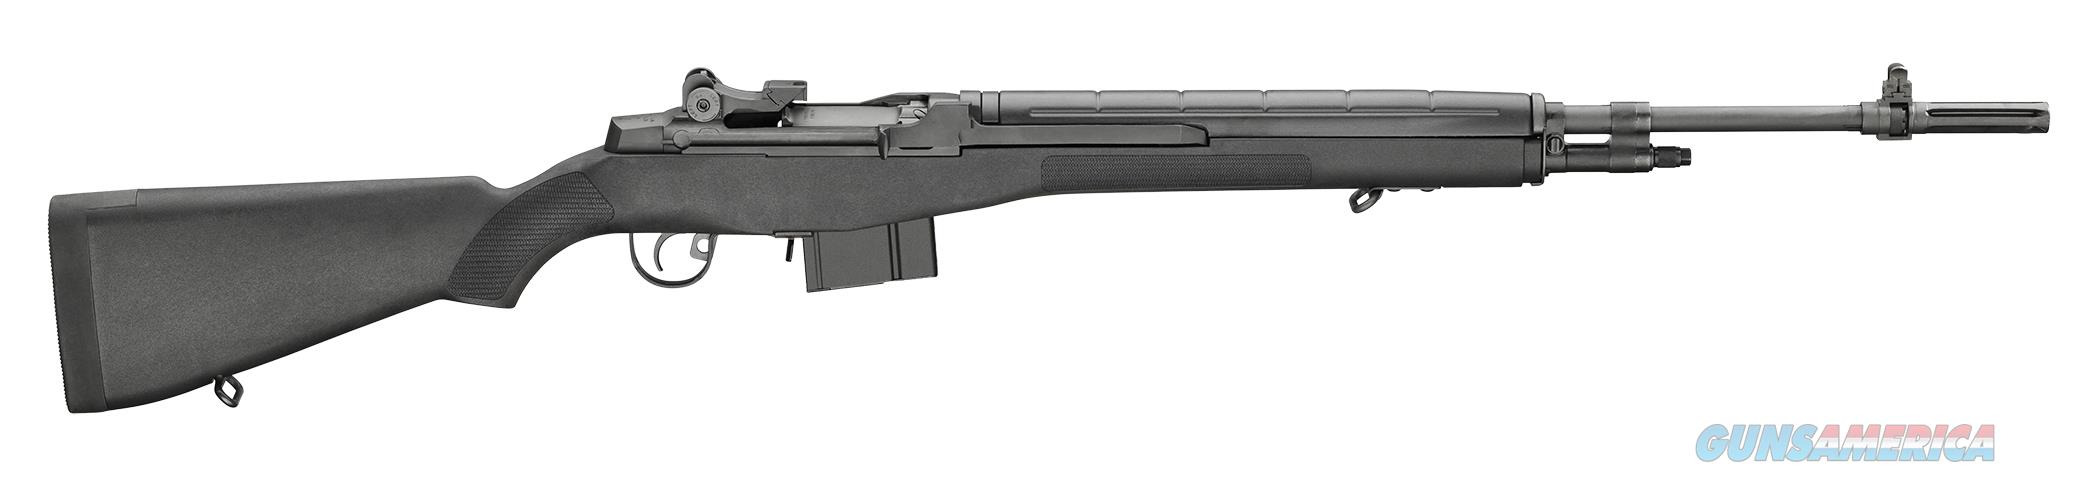 "Springfield Armory M1A Loaded 7.62 NATO 22"" Black MA9226   Guns > Rifles > Springfield Armory Rifles > M1A/M14"